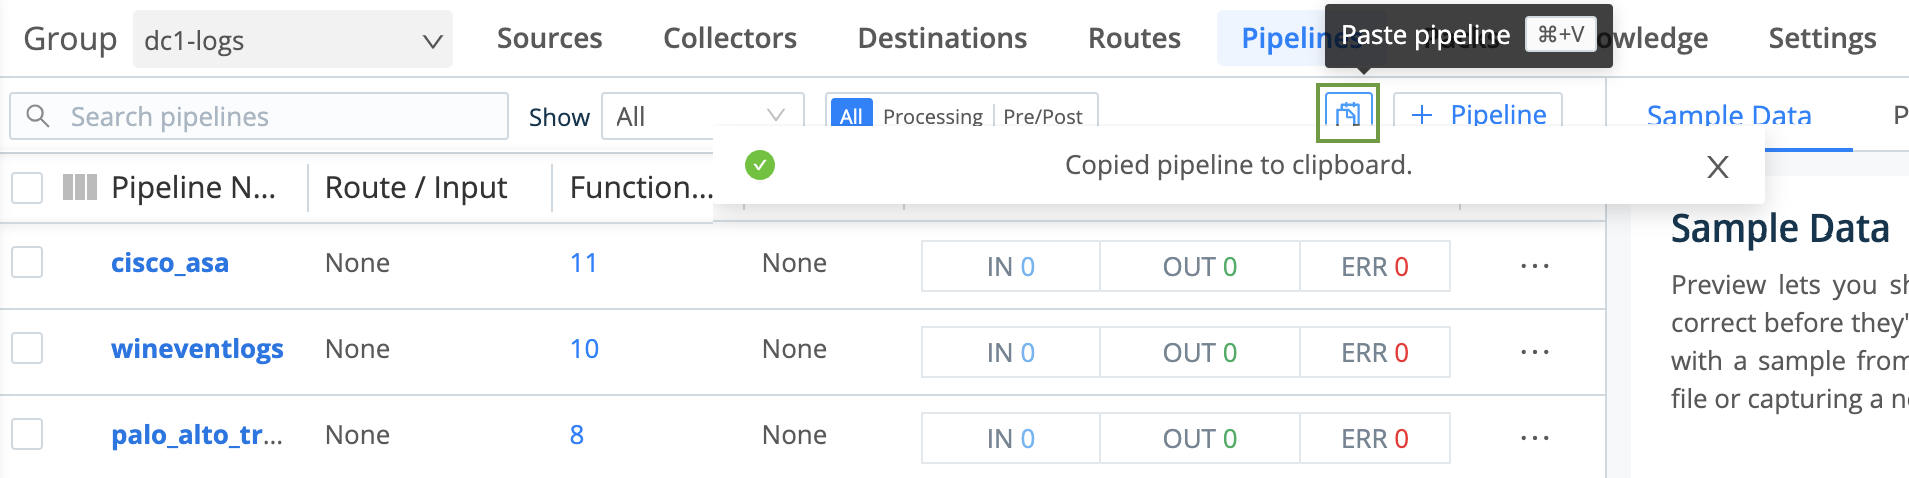 Paste button for copied Pipeline